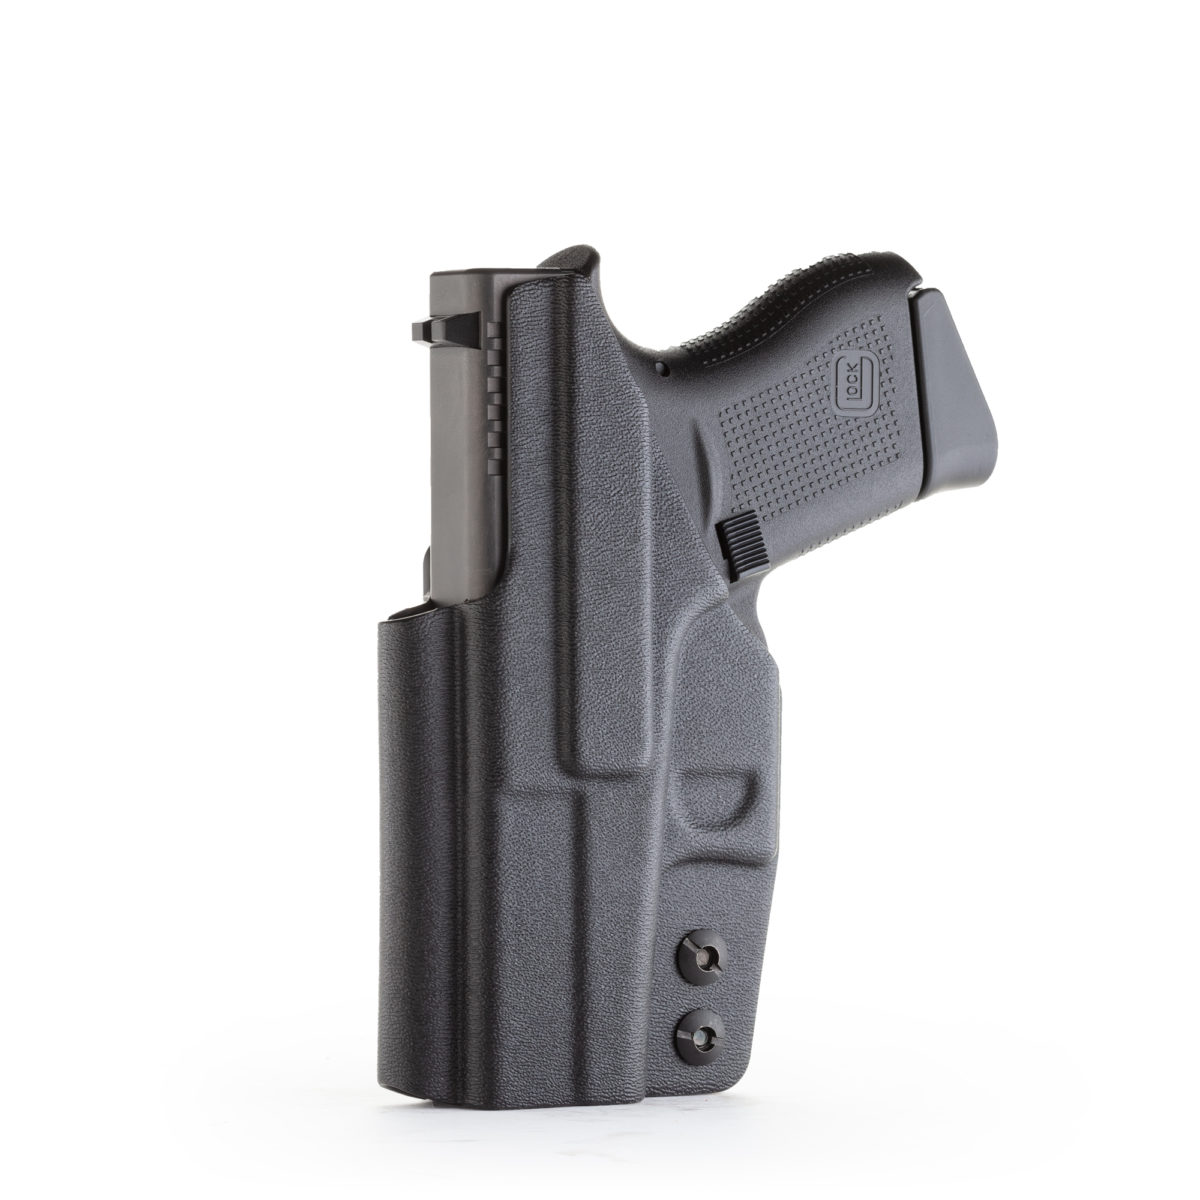 Kydex IWB Holster Glocks